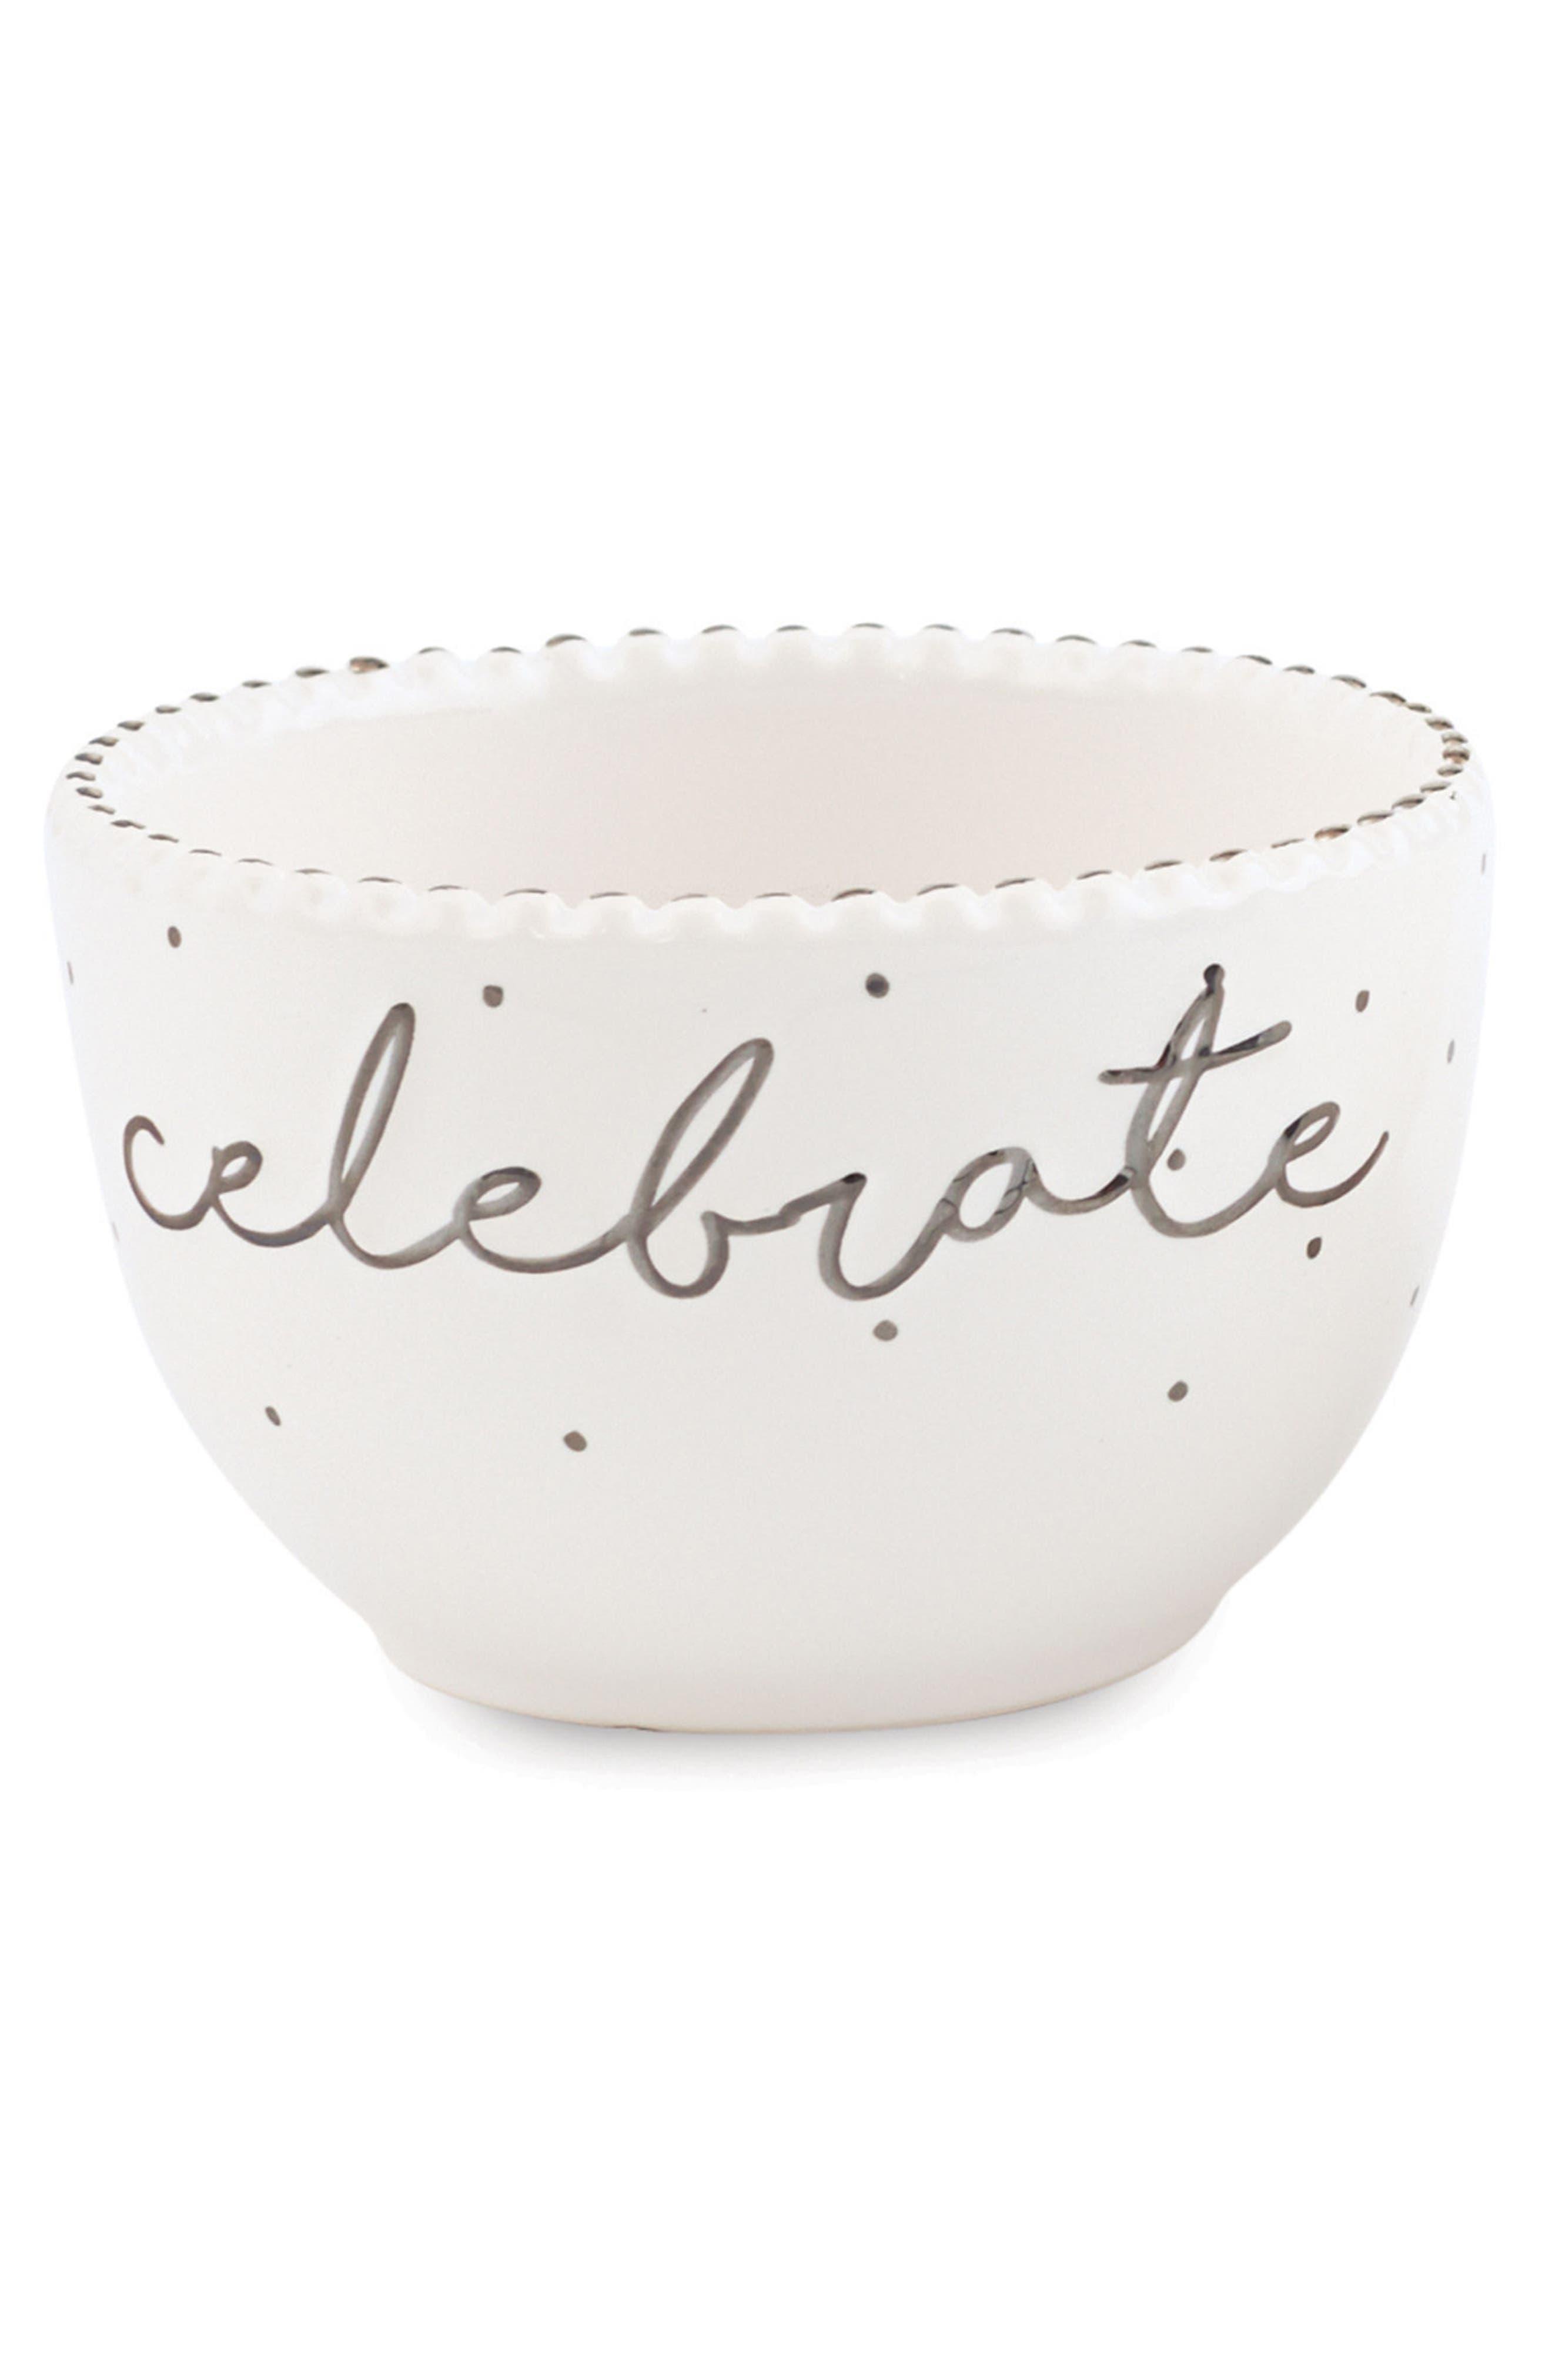 Celebrate Stoneware Dip Cup,                         Main,                         color, 100